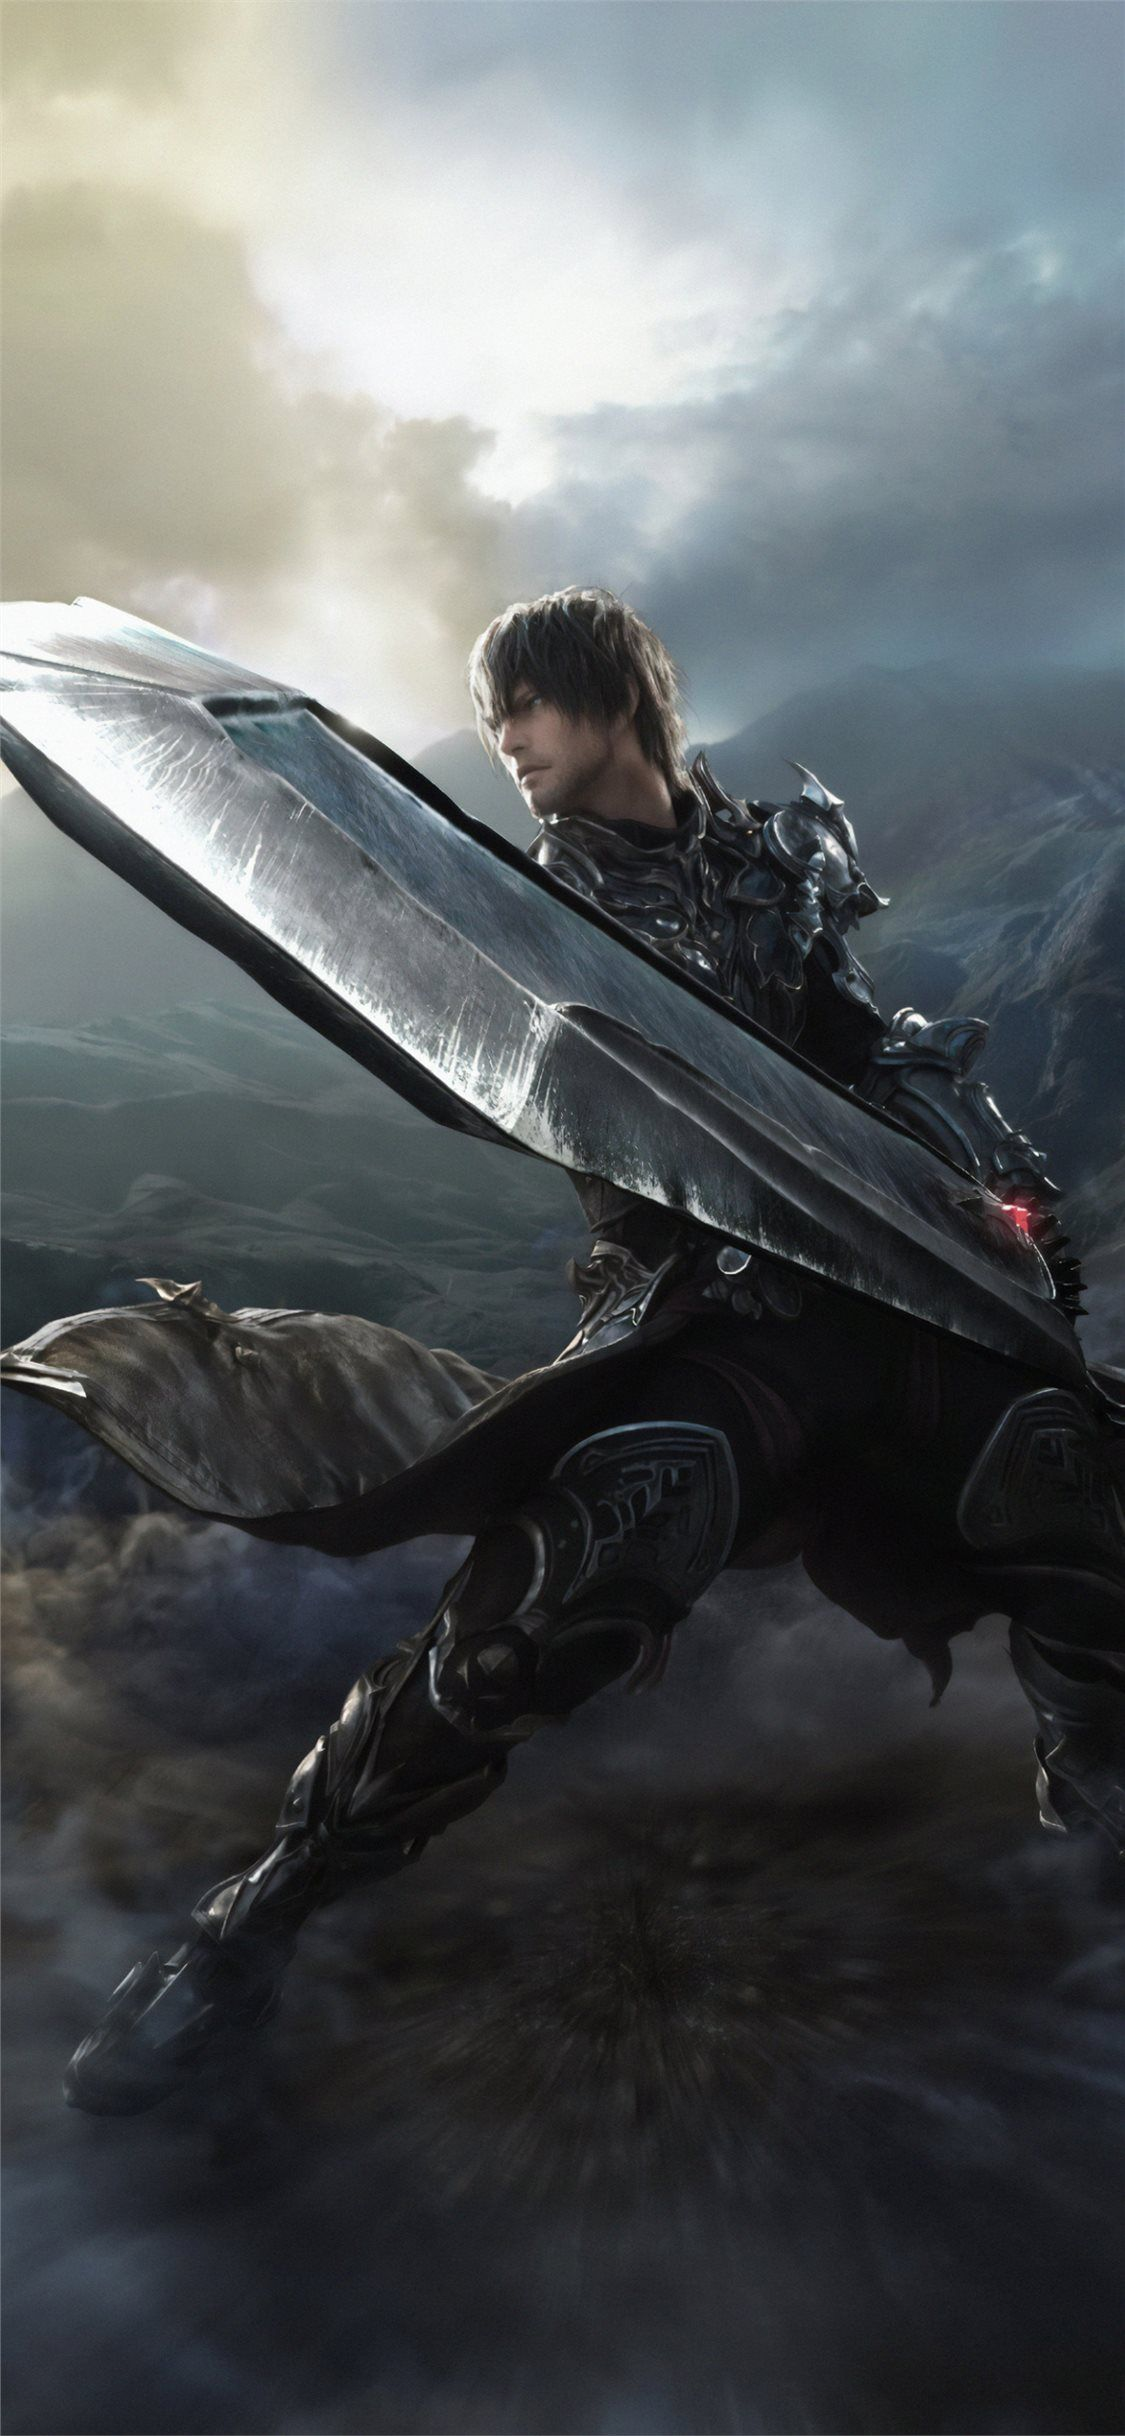 Final Fantasy Vii Iphone 11 Wallpapers Wallpaper Cave